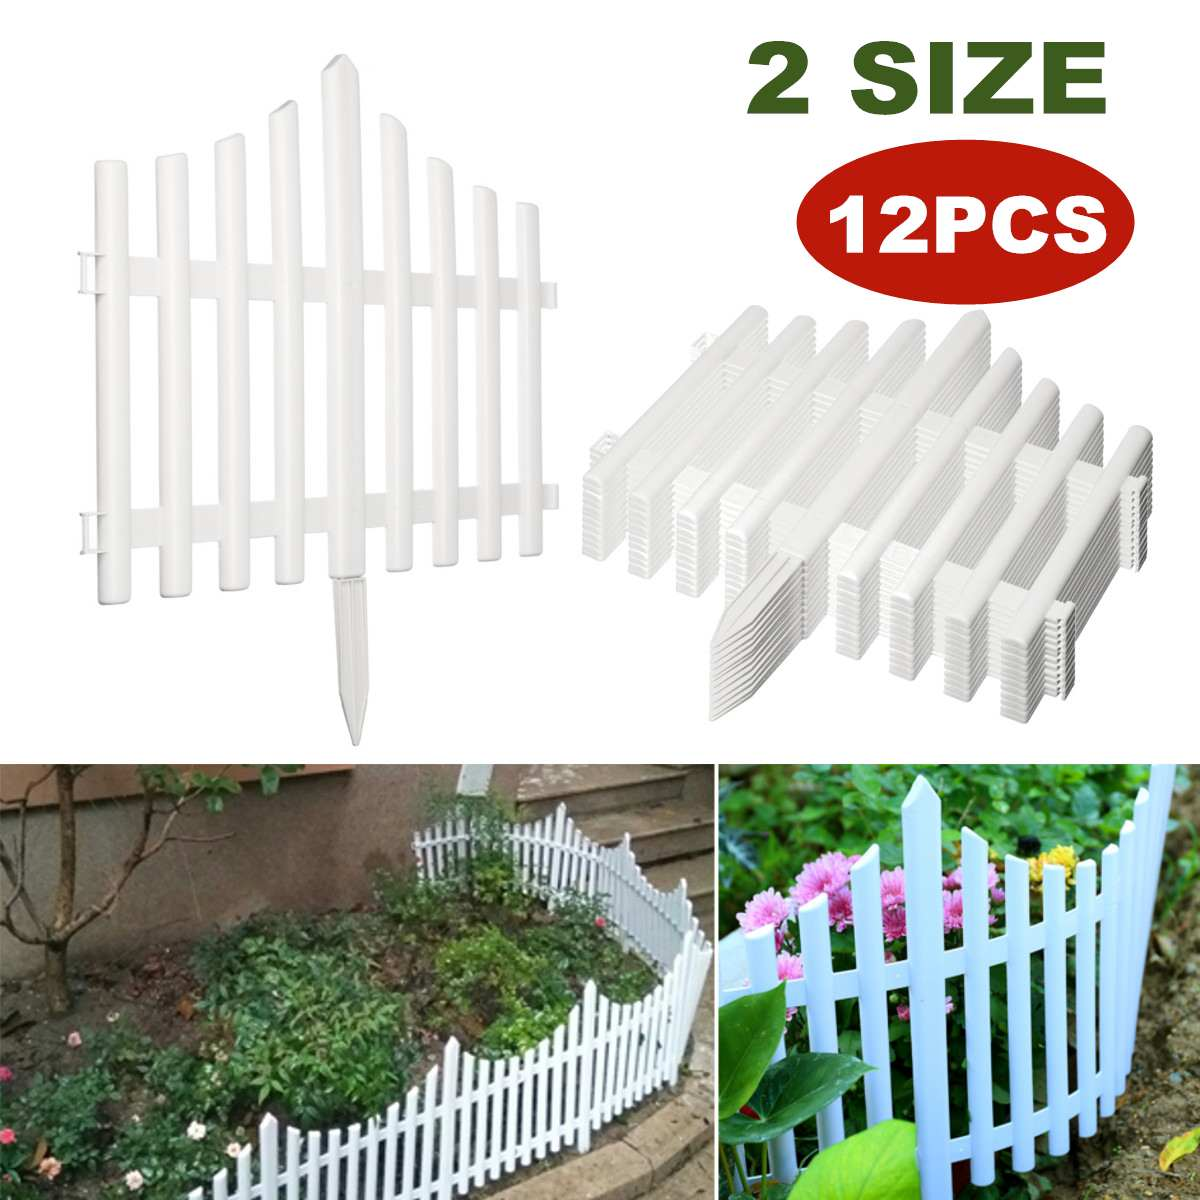 DIY 12PCS Plastic Garden Fence Set Courtyard Edging Border Fencing Panel Outdoor Yard Garden Decorations Easy Assemble White